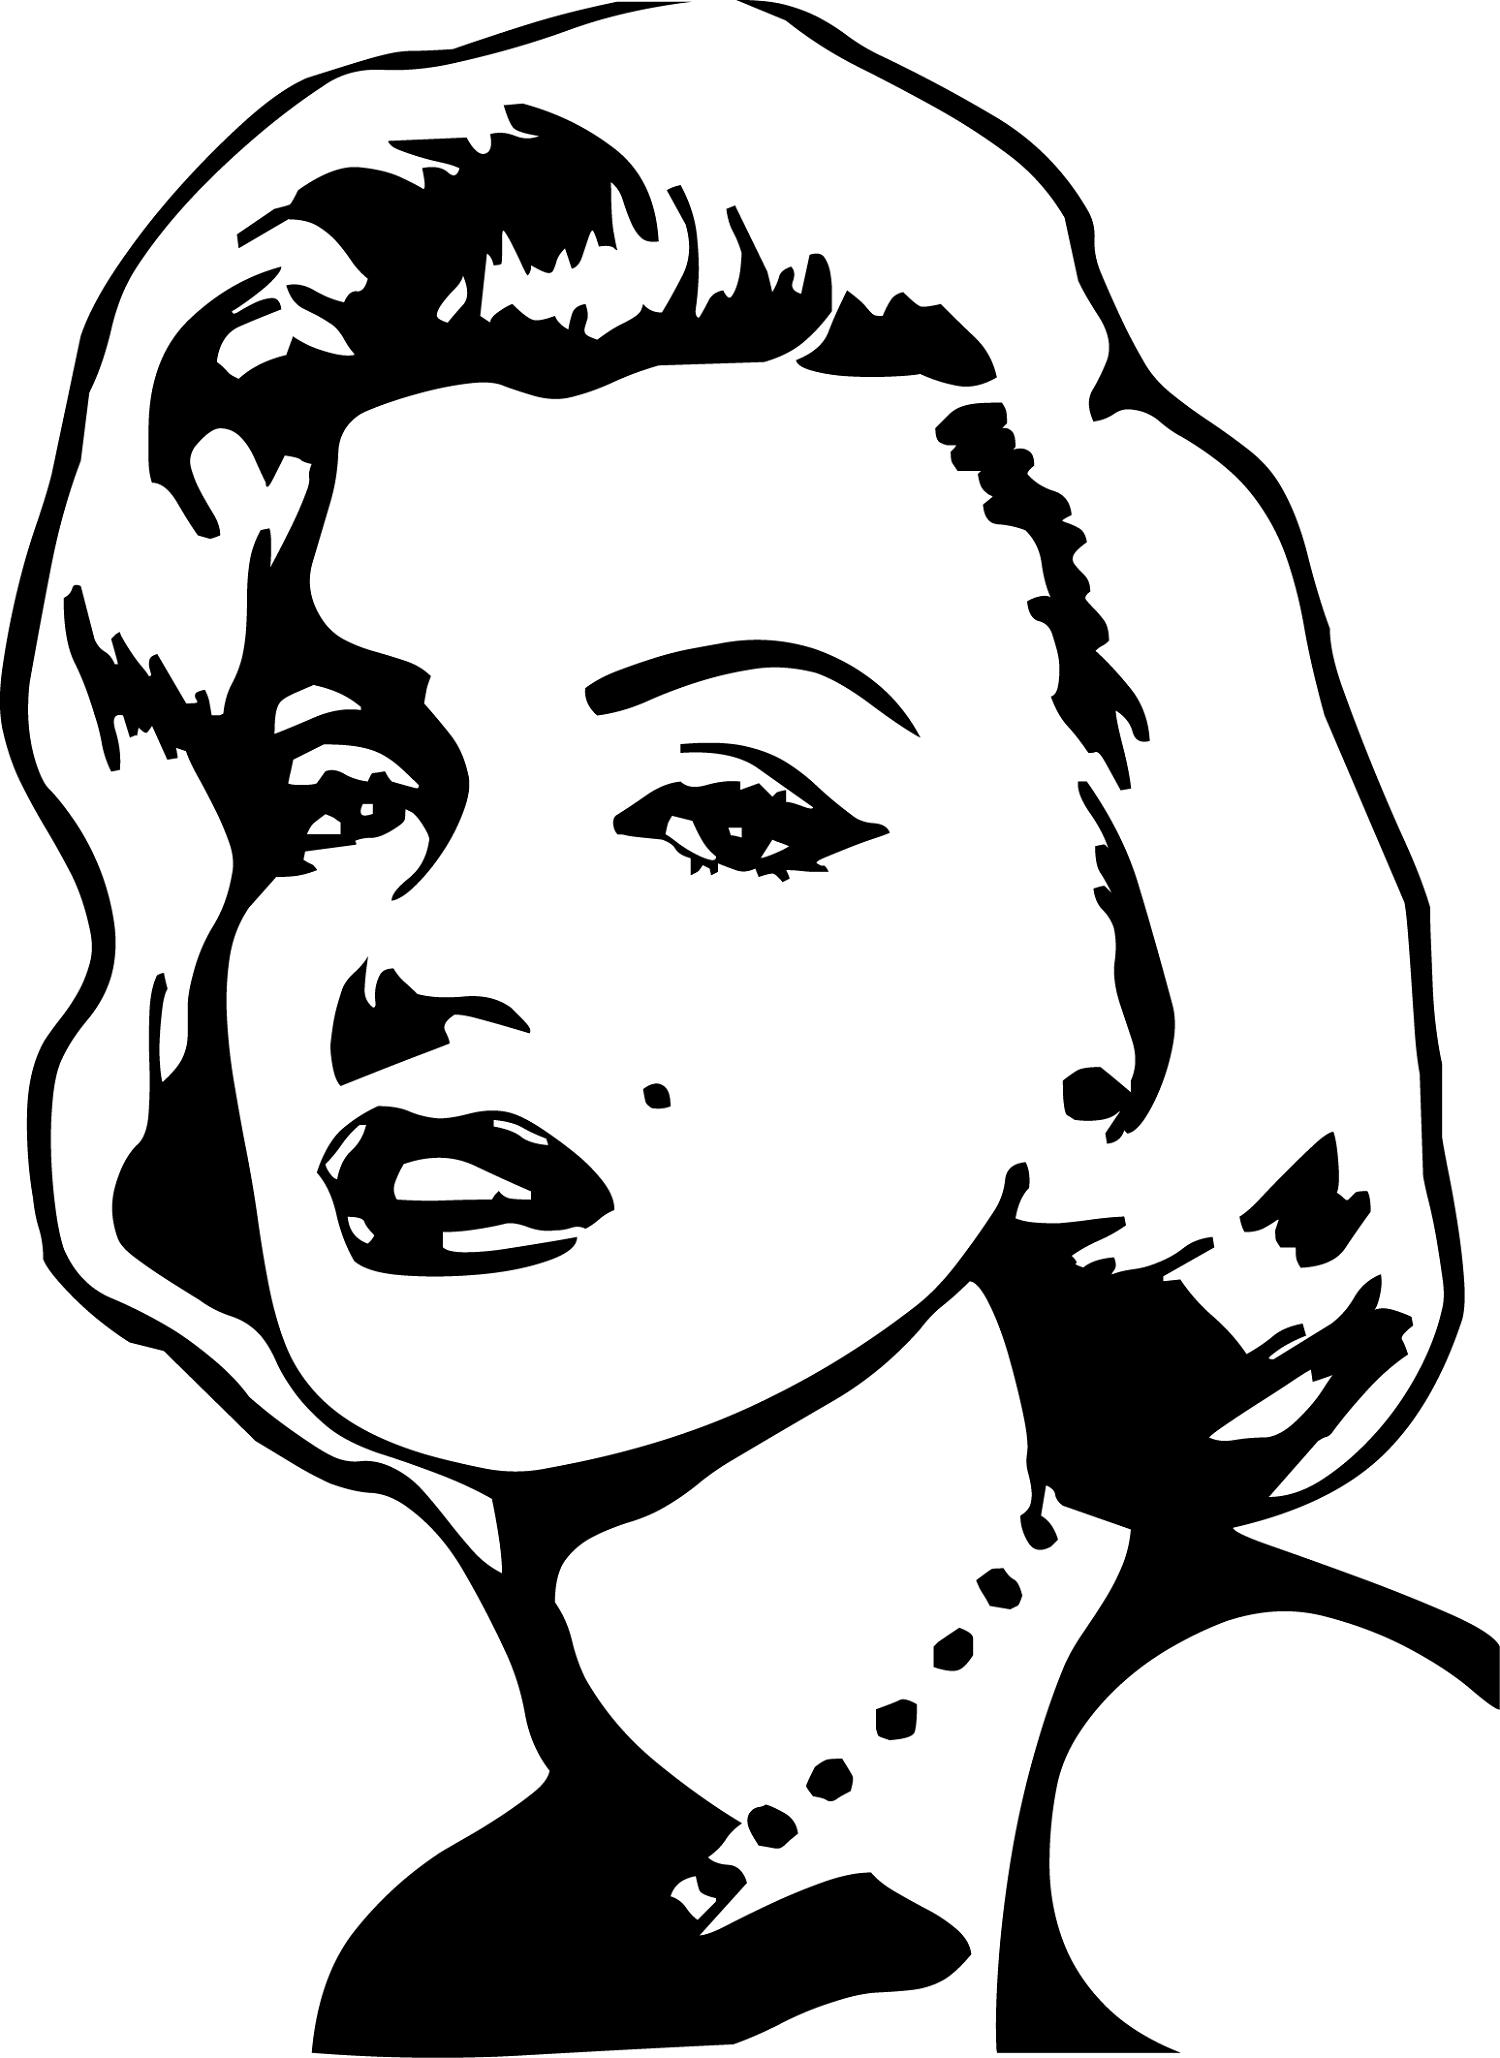 Marilyn Monroe Coloring Pages | 그림, 팝아트, 코믹 아트